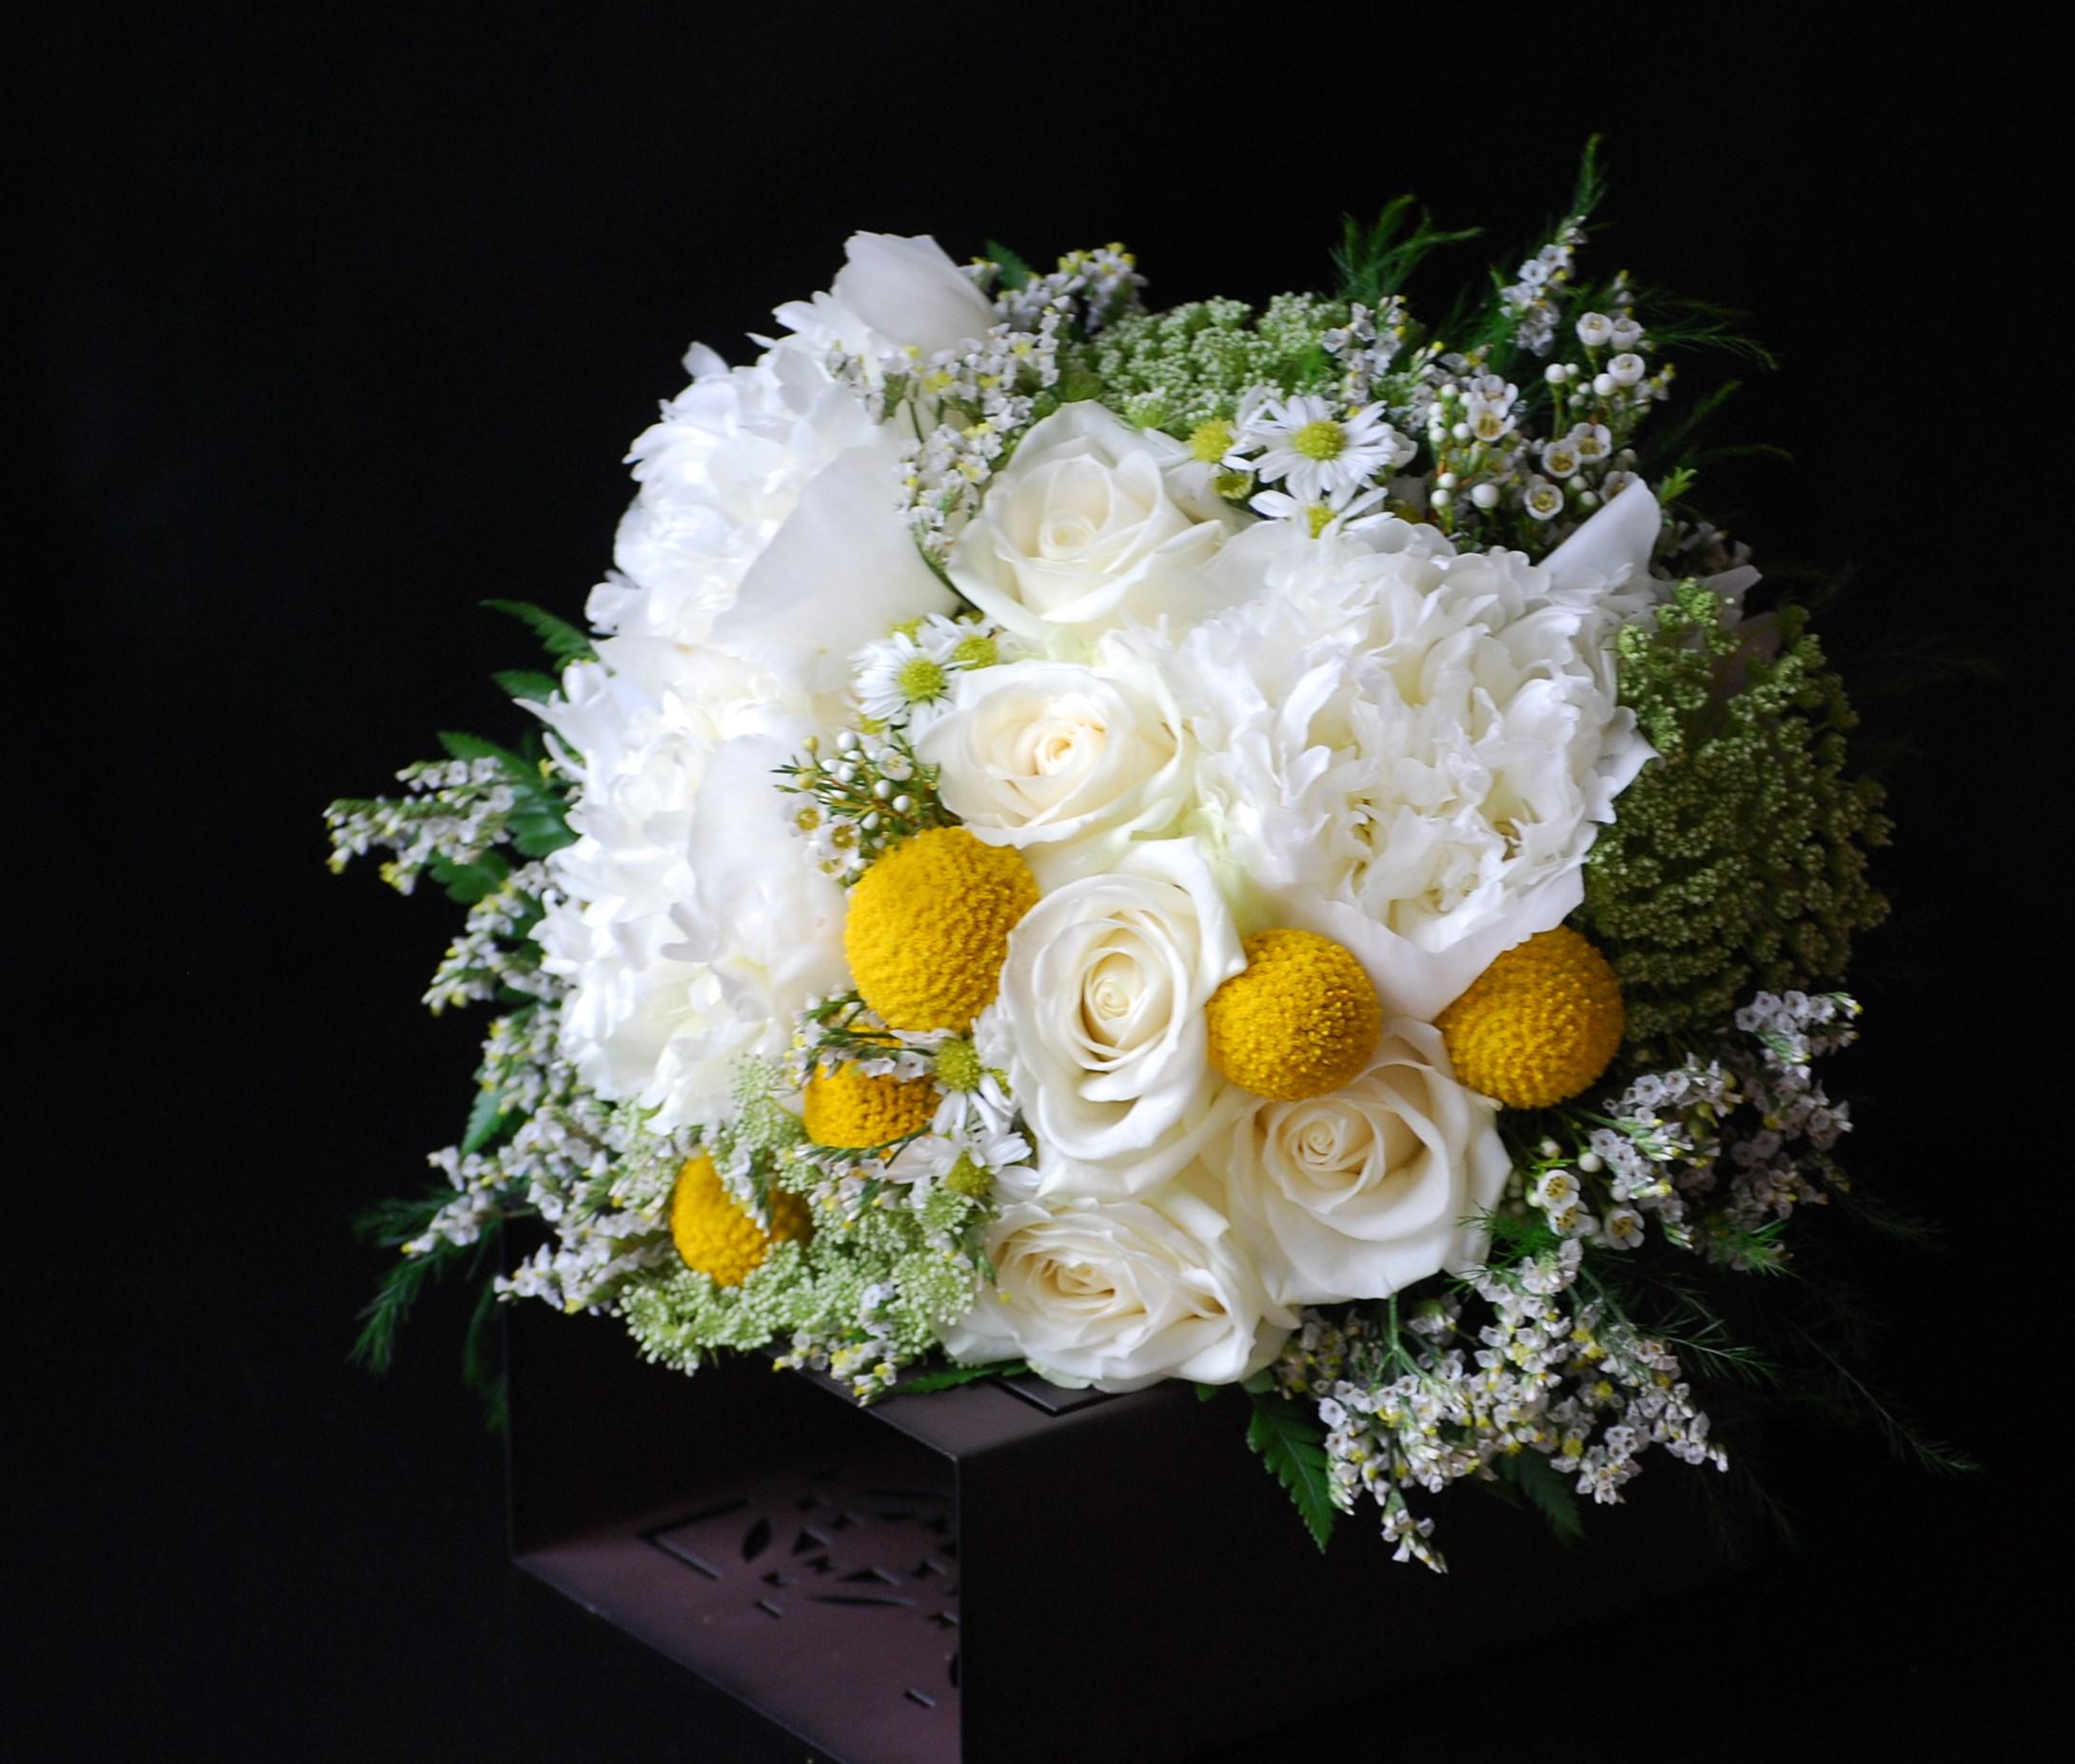 Floral Design by Lili, Bridesmaid bouquet